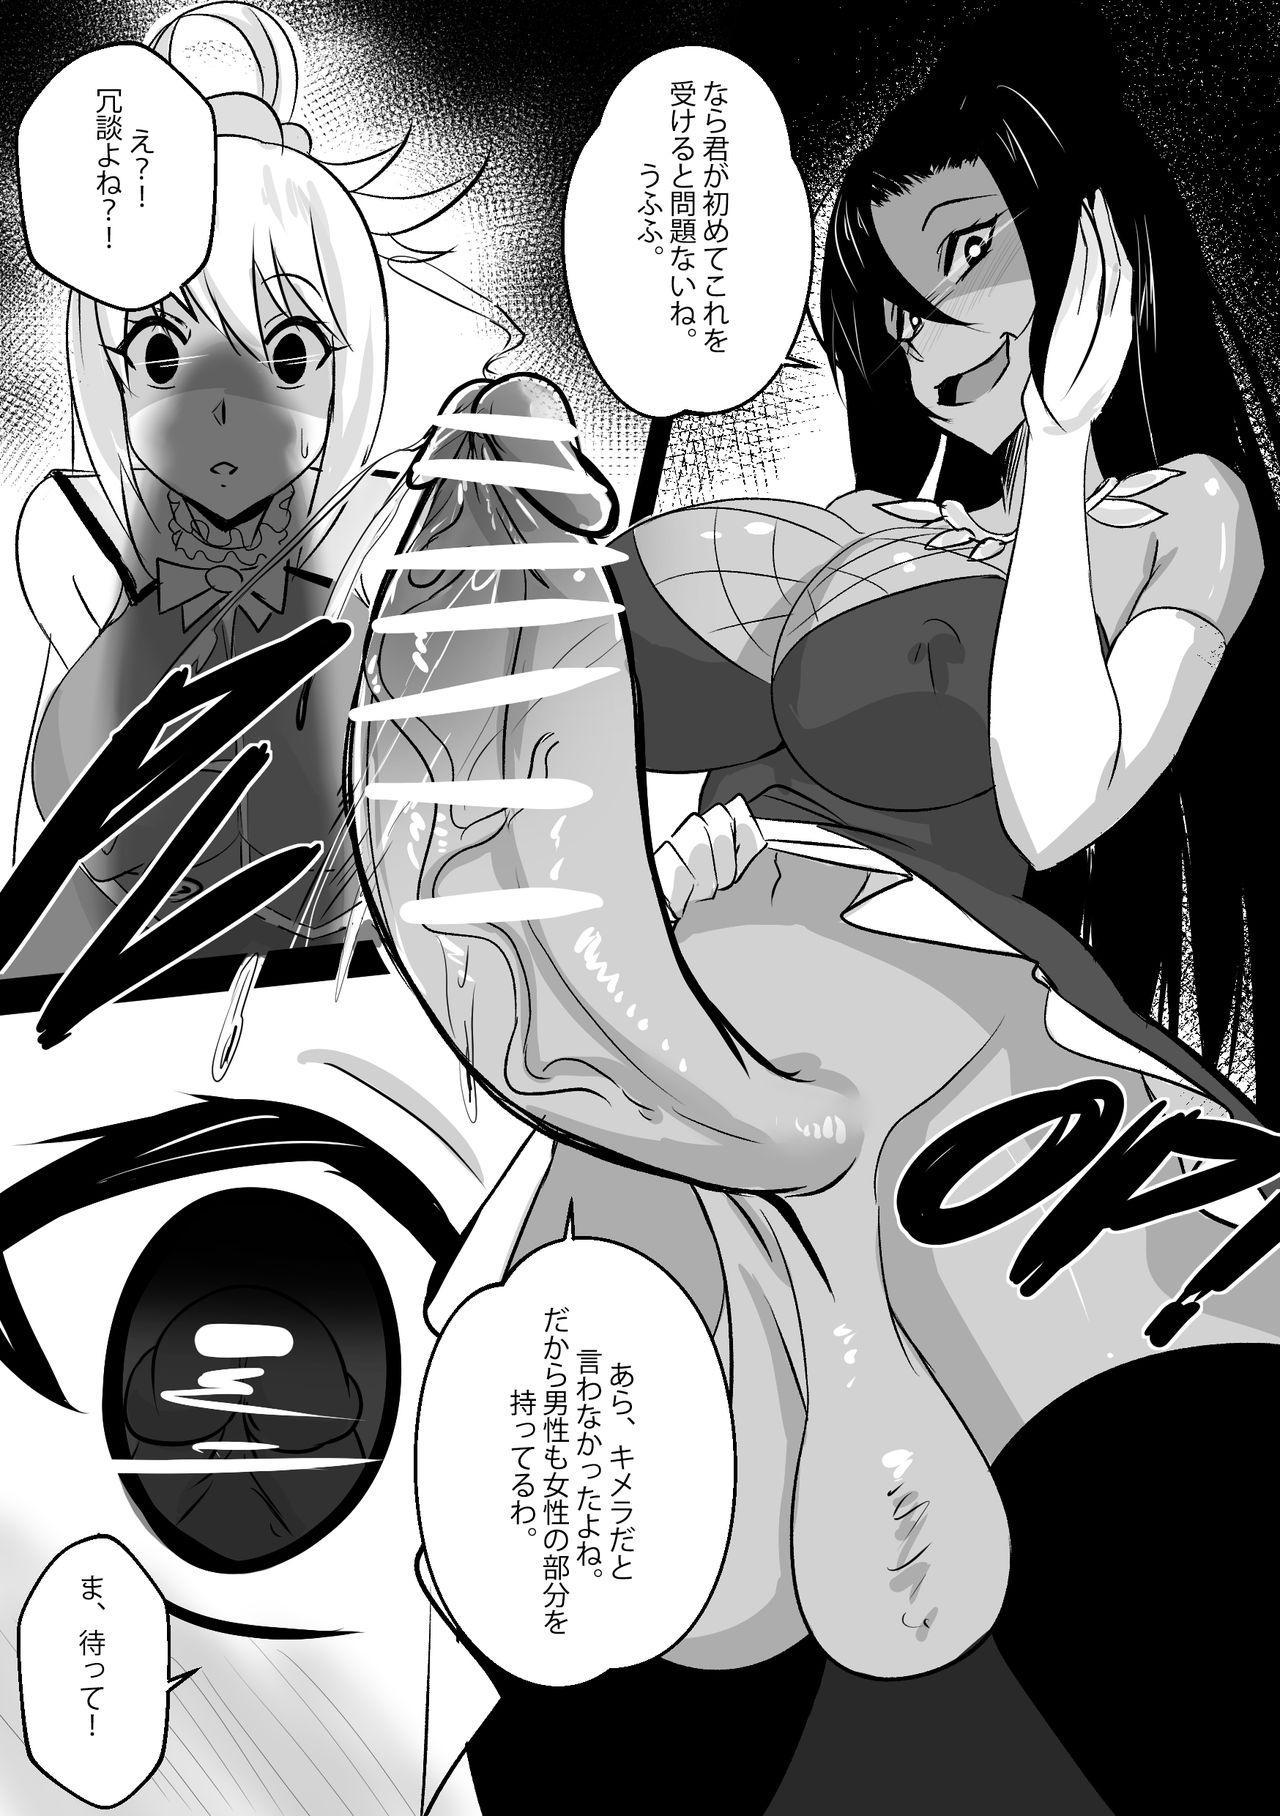 B-Trayal 29 Sylvia(kunosuba) Censored (JP) 3